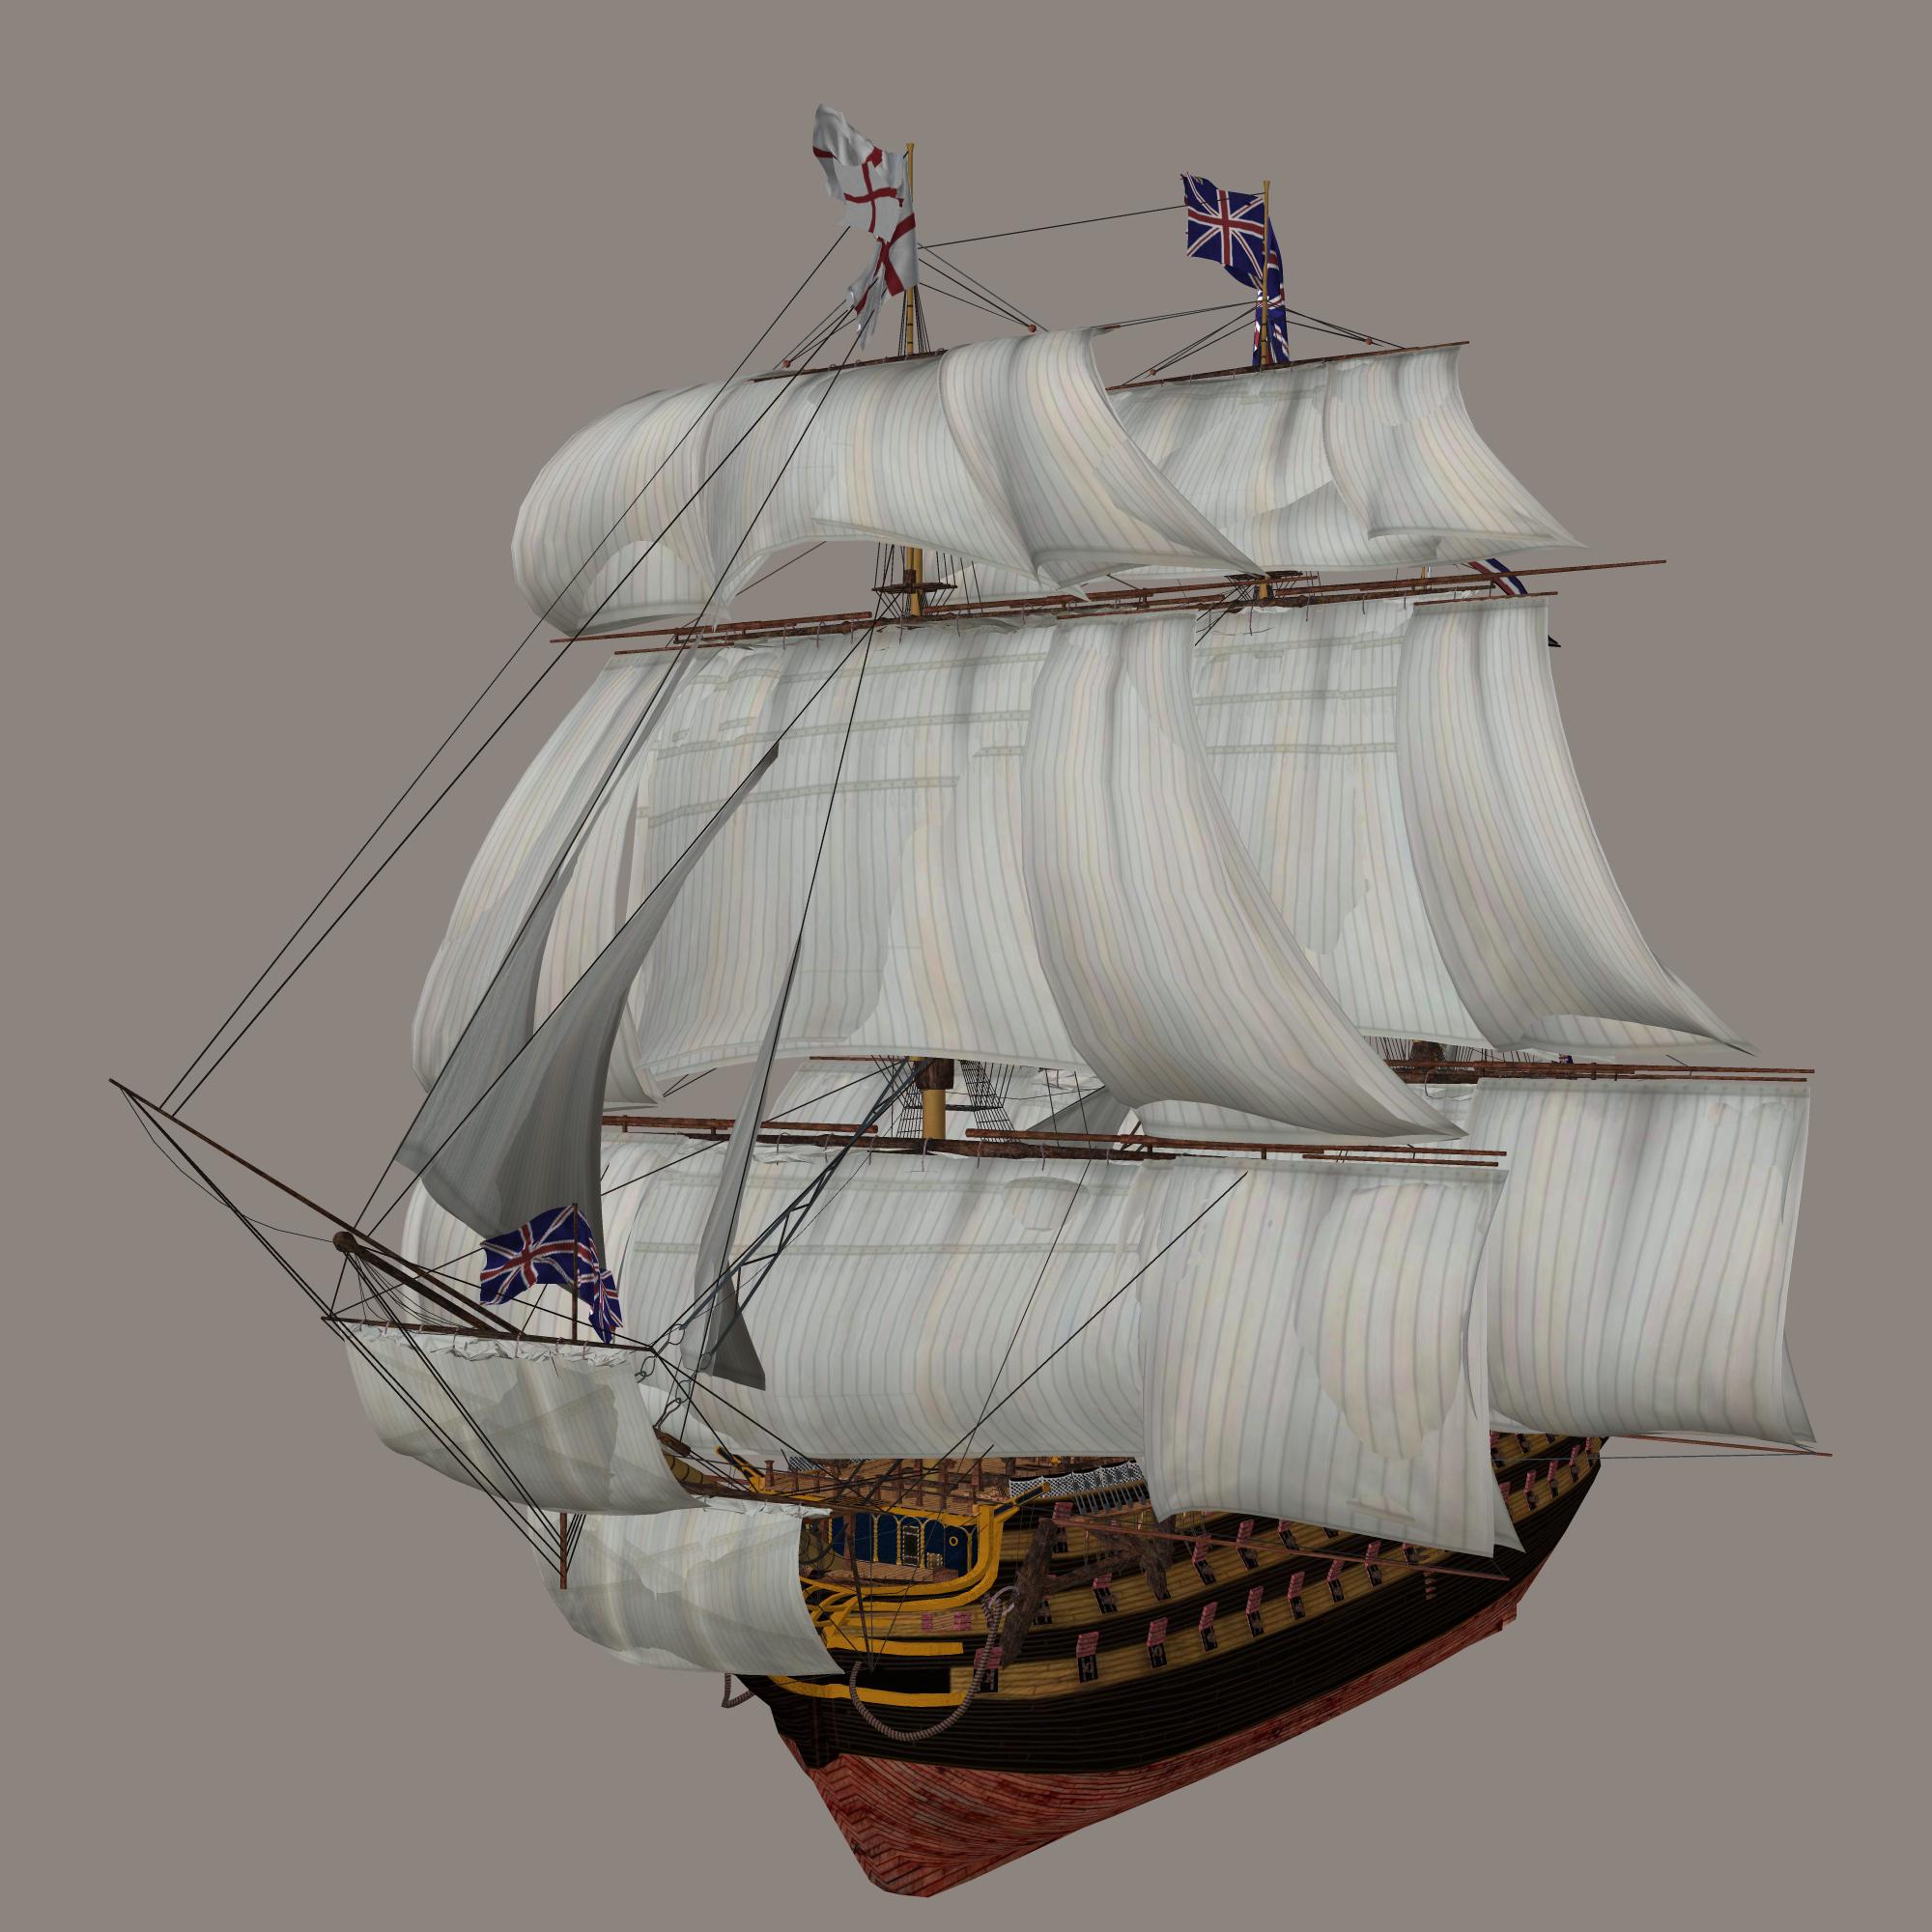 Old ship sun clipart svg transparent download Sailing ship PNG image | SB - C | Pinterest | Sailing ships and Ships svg transparent download